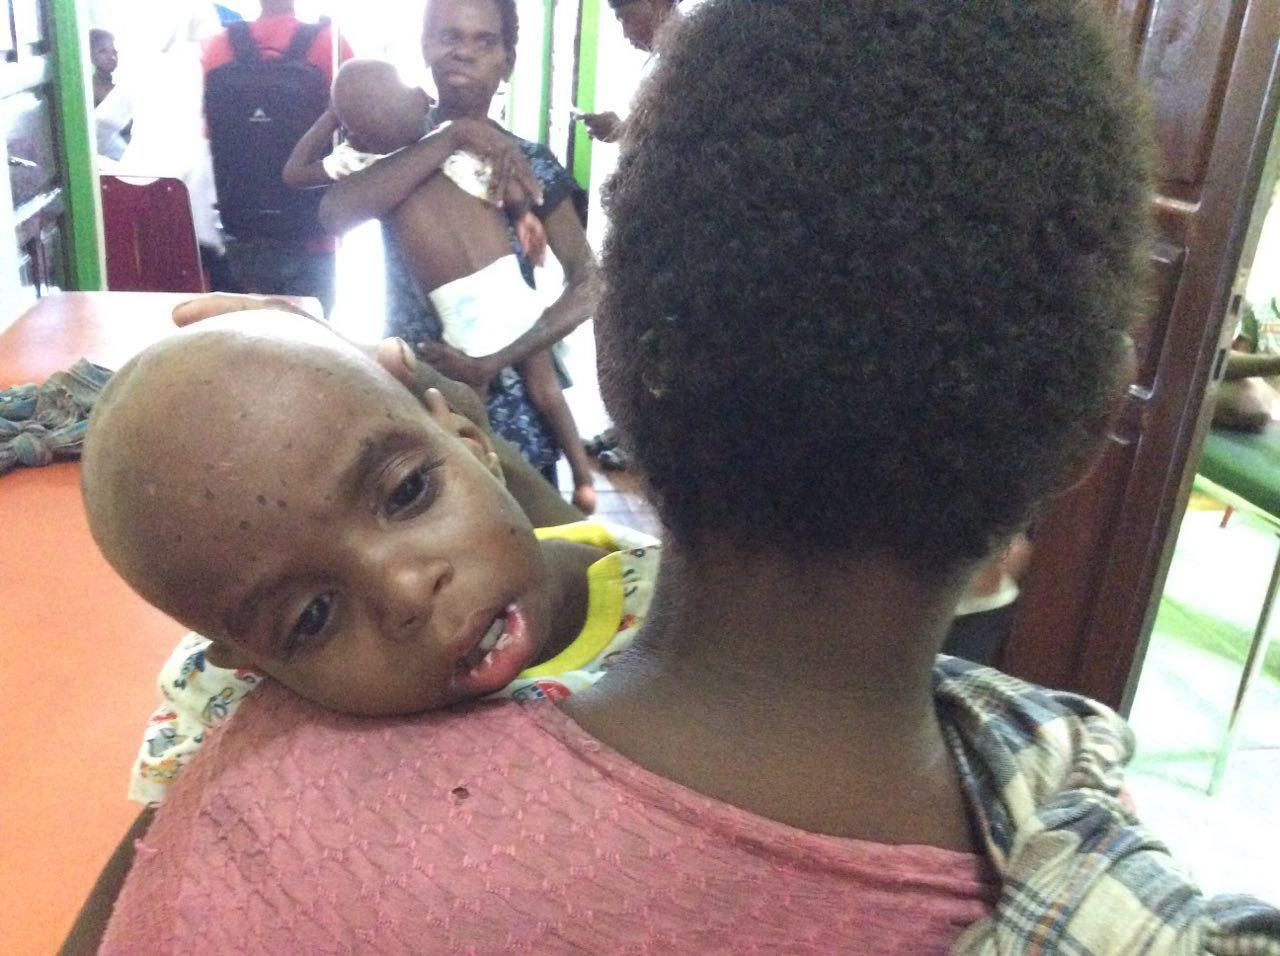 Salah satu gizi buruk Asmat yang dievakuasi ke RSUD Agats di Asmat. (Liputan6.com /Katharina Janur)